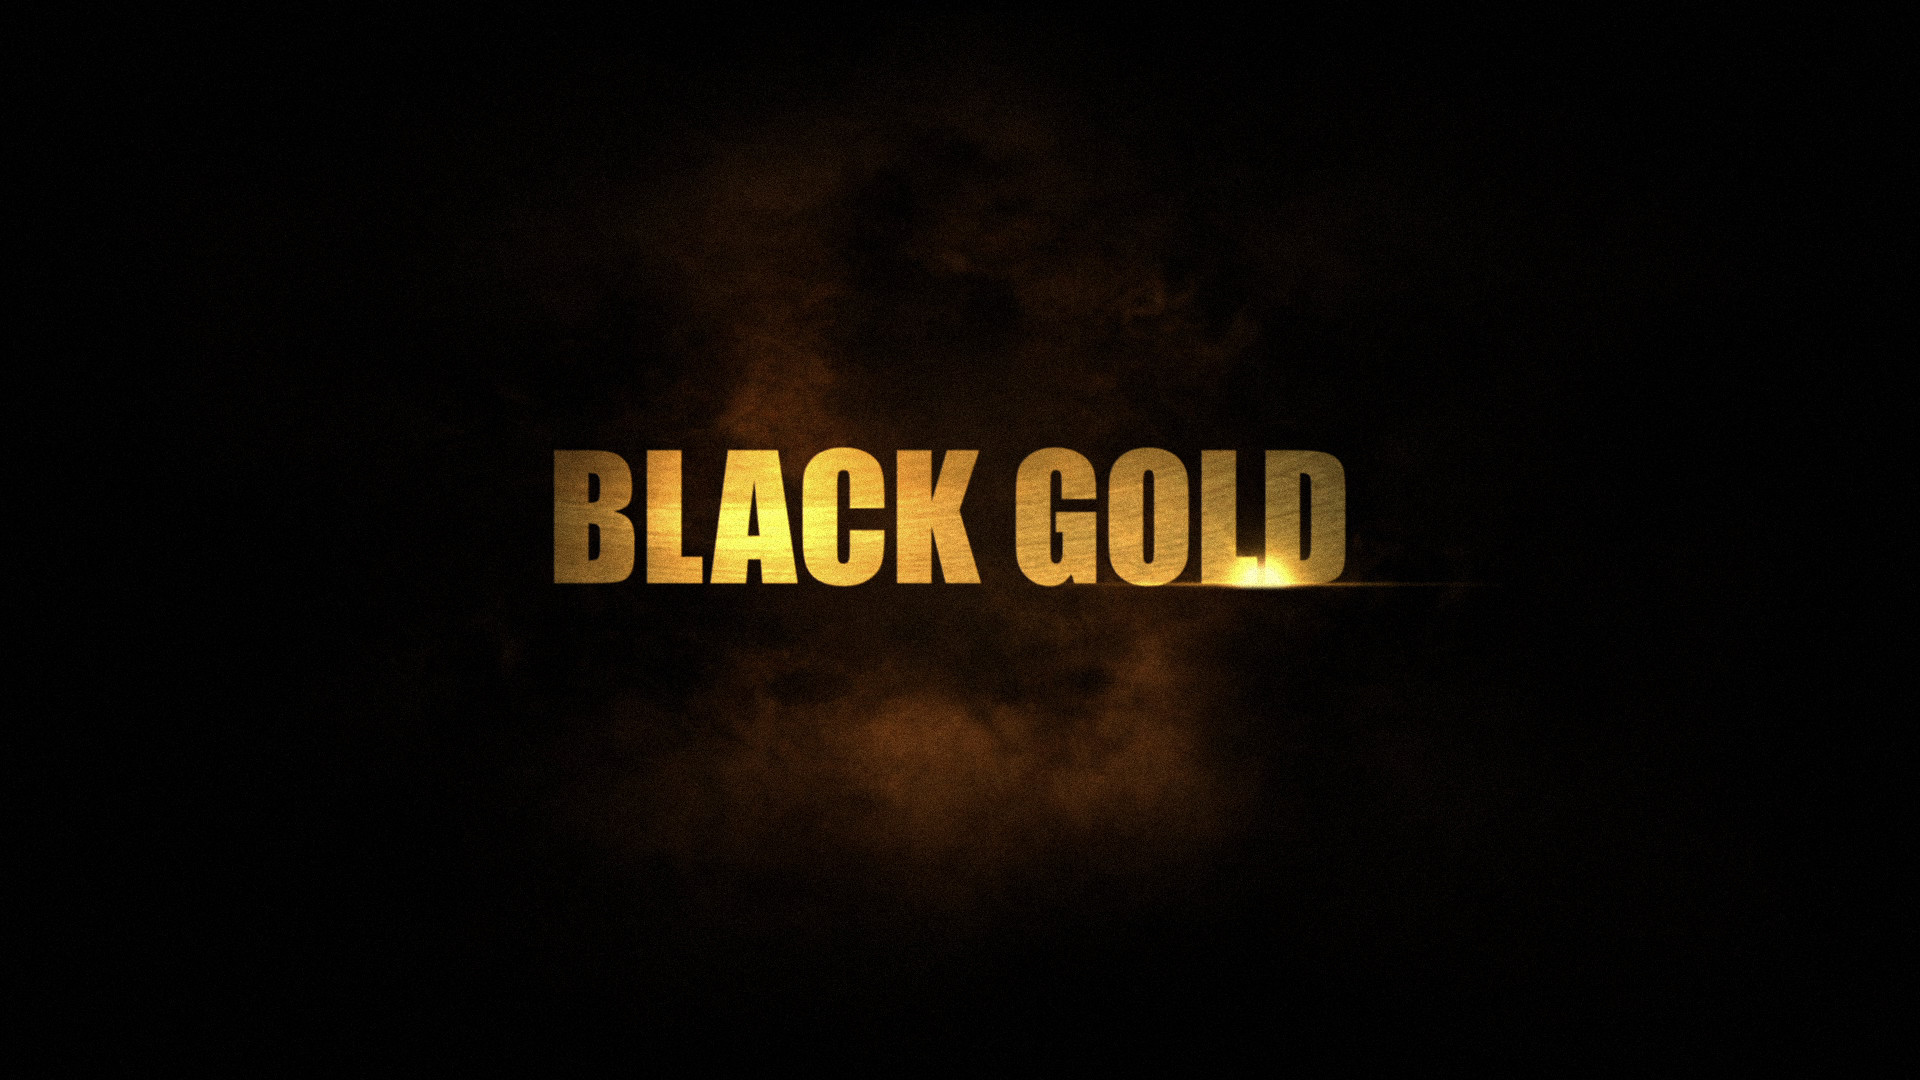 black, gold, background, brewery, cairngorm, blackgold